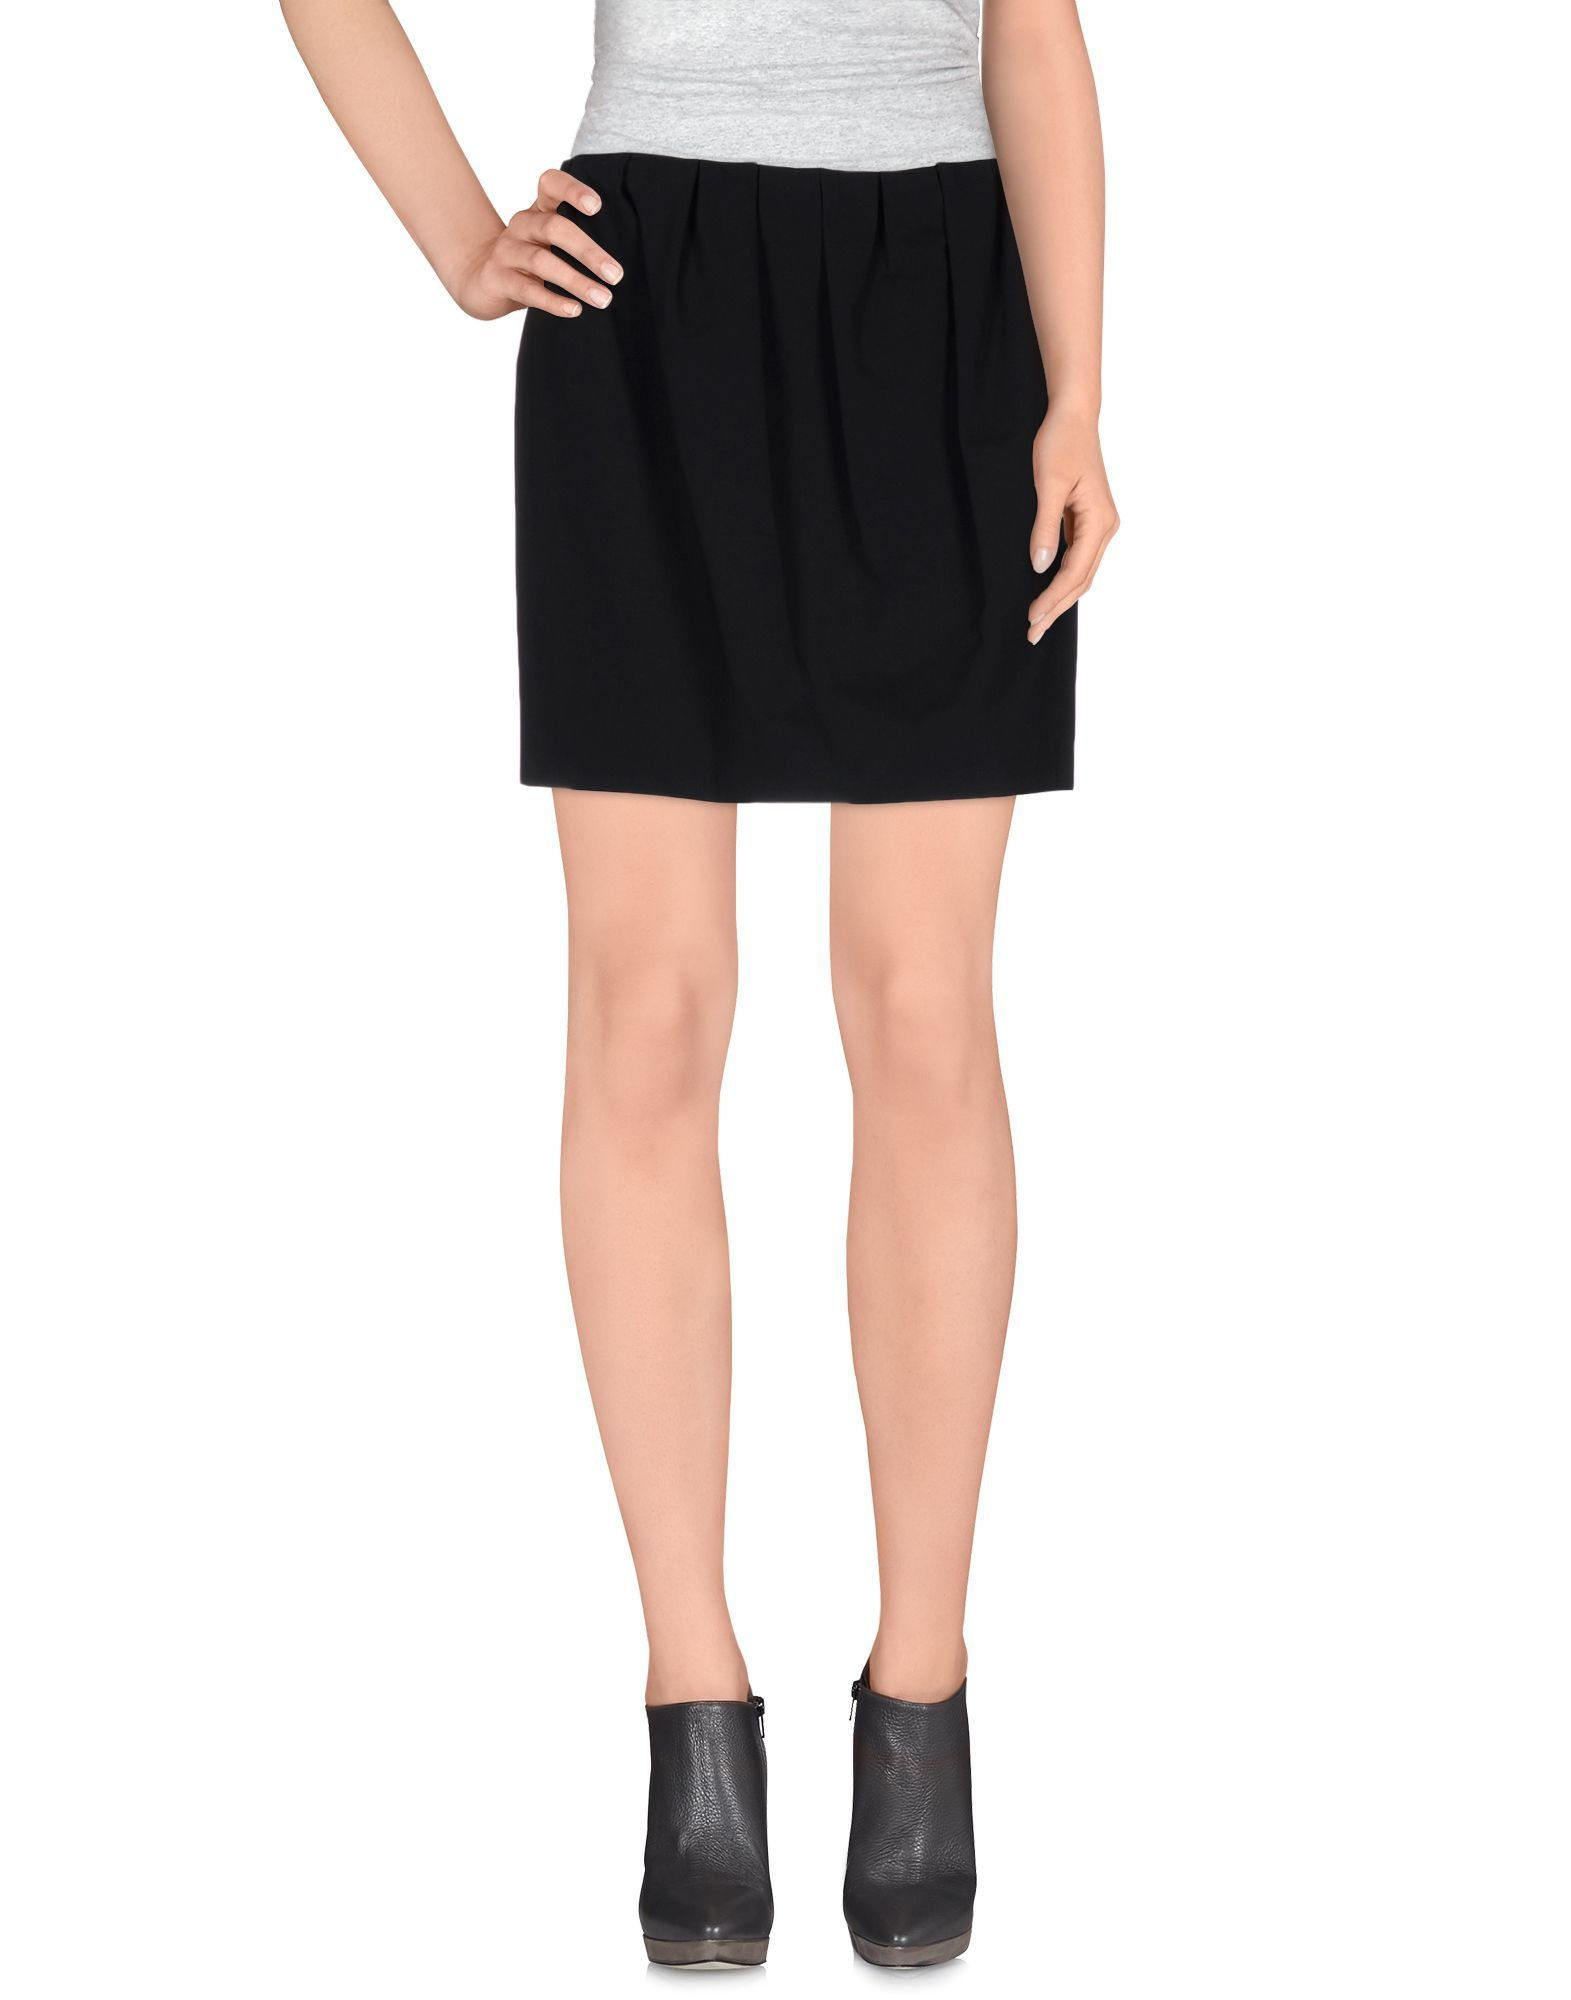 Just Cavalli Black Short Skirt